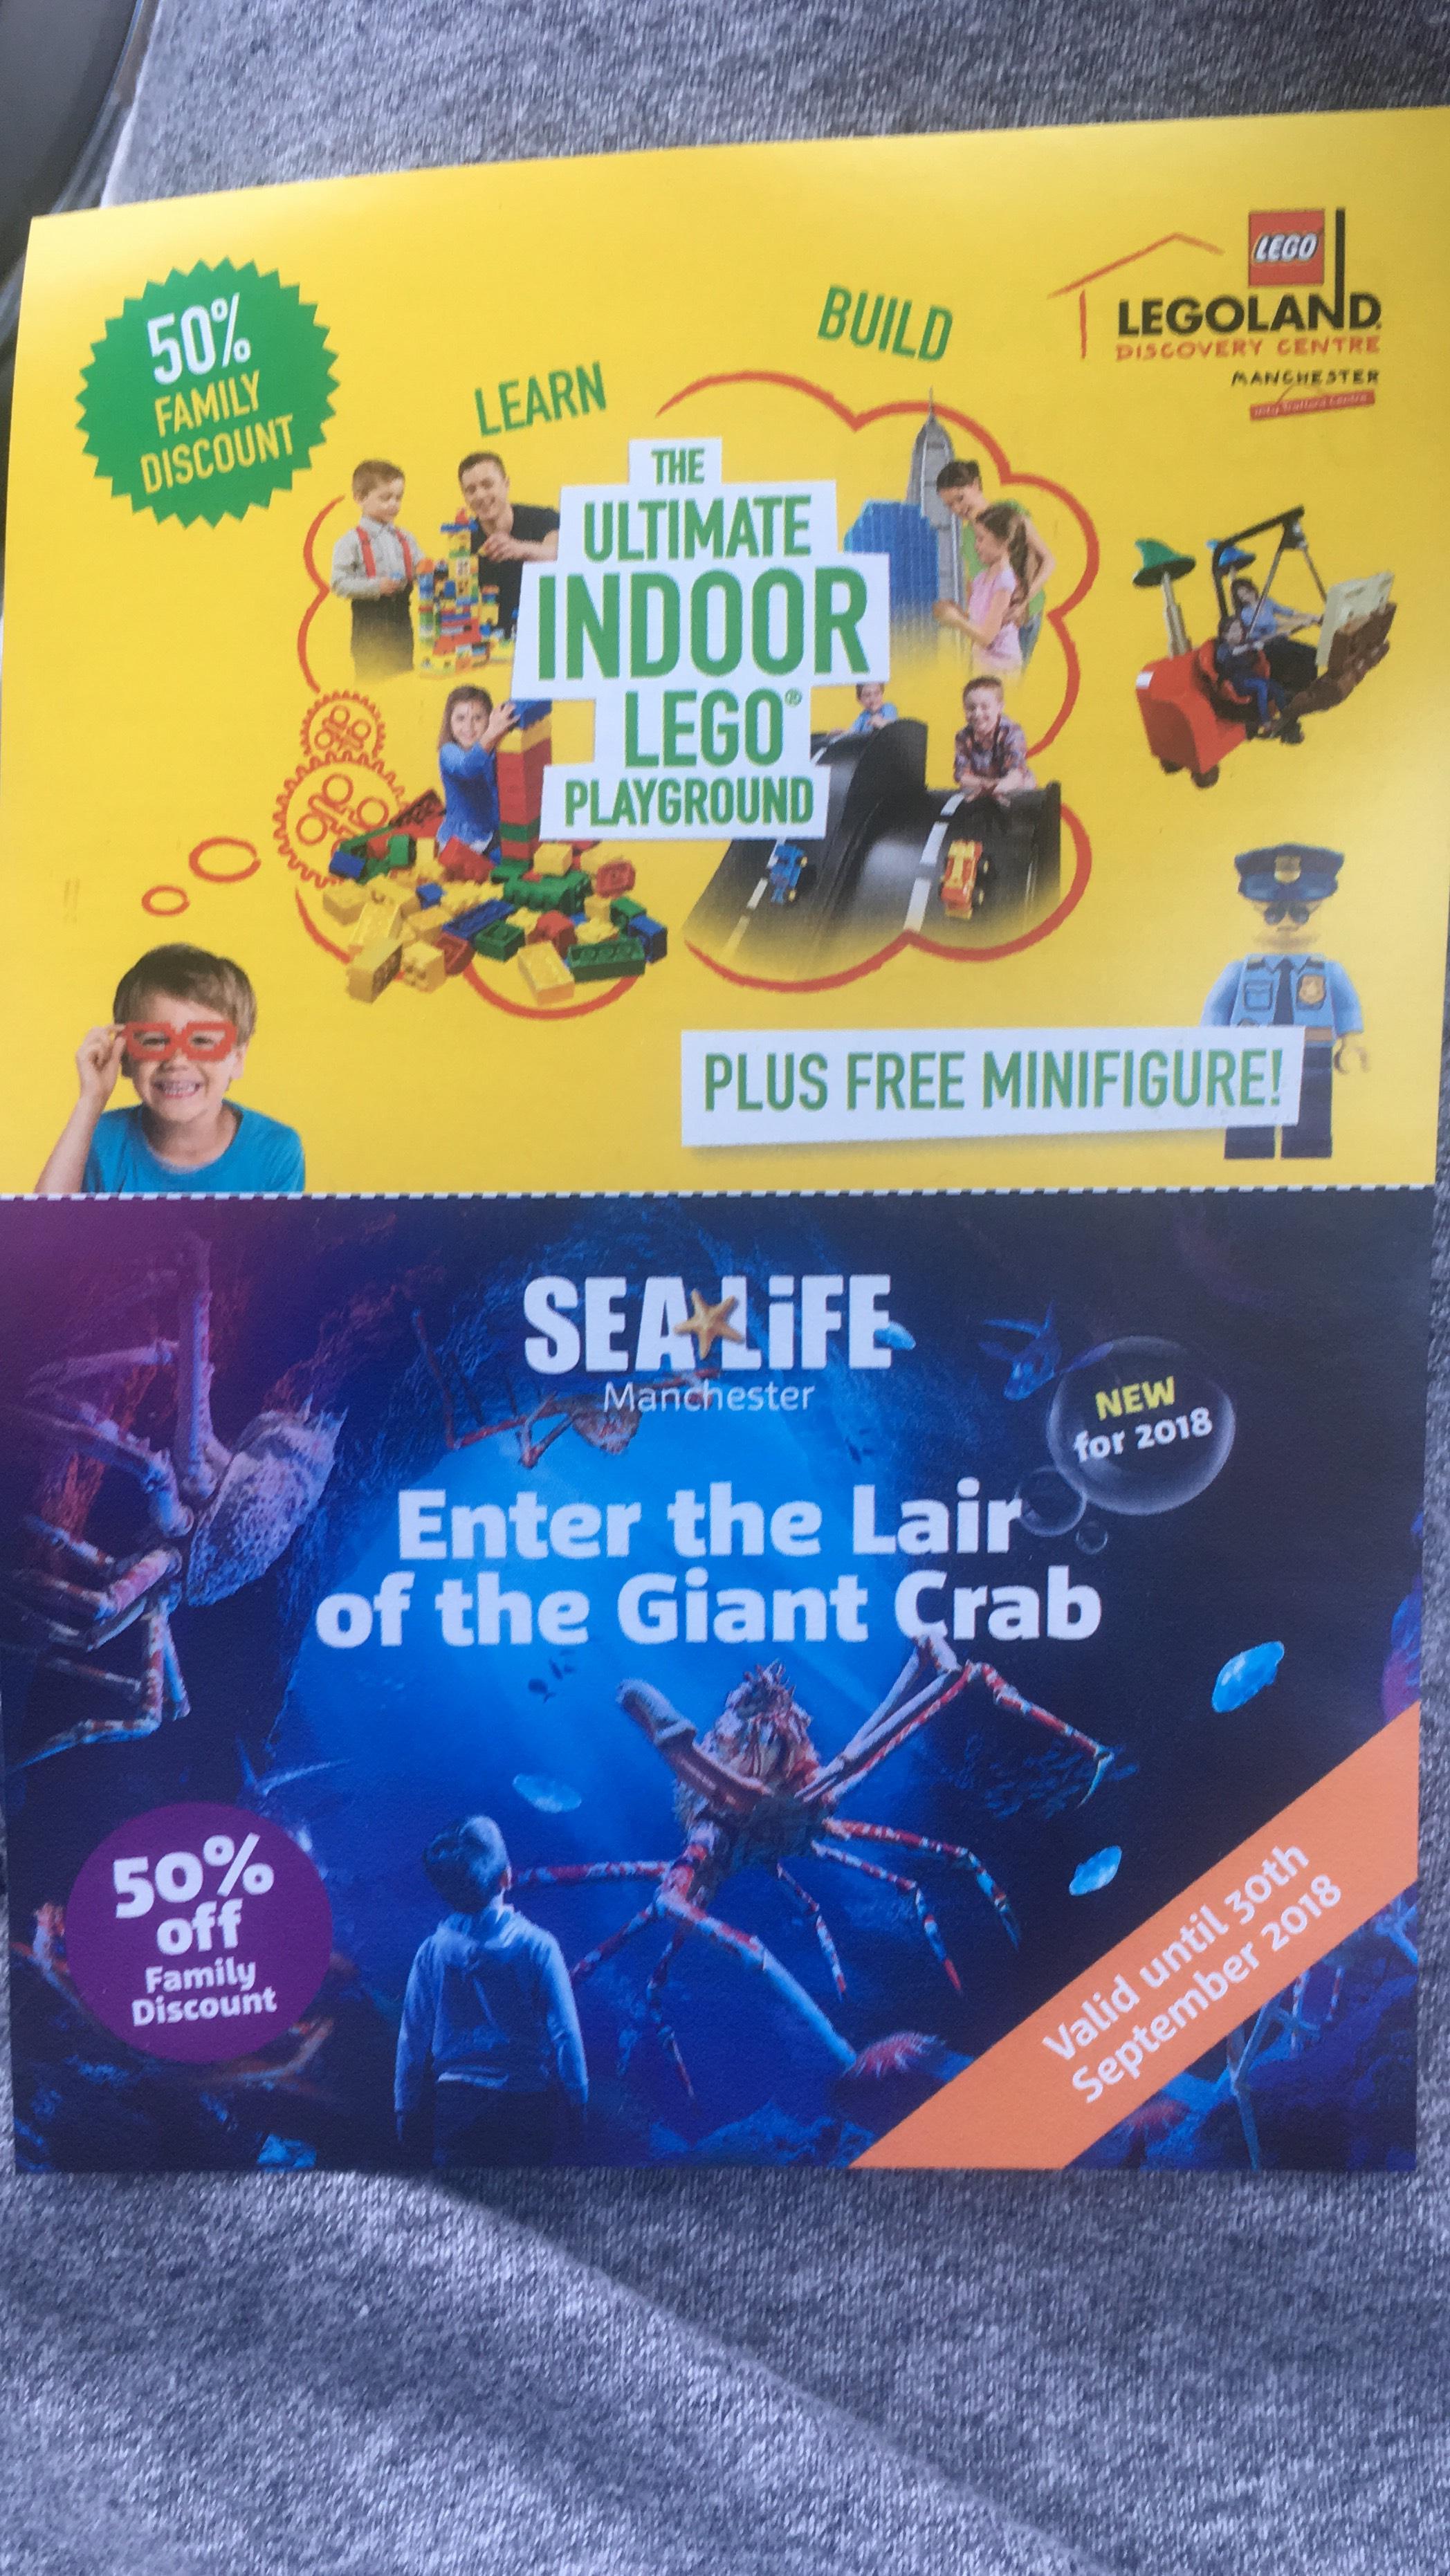 Manchester LegoLand/SeaLife